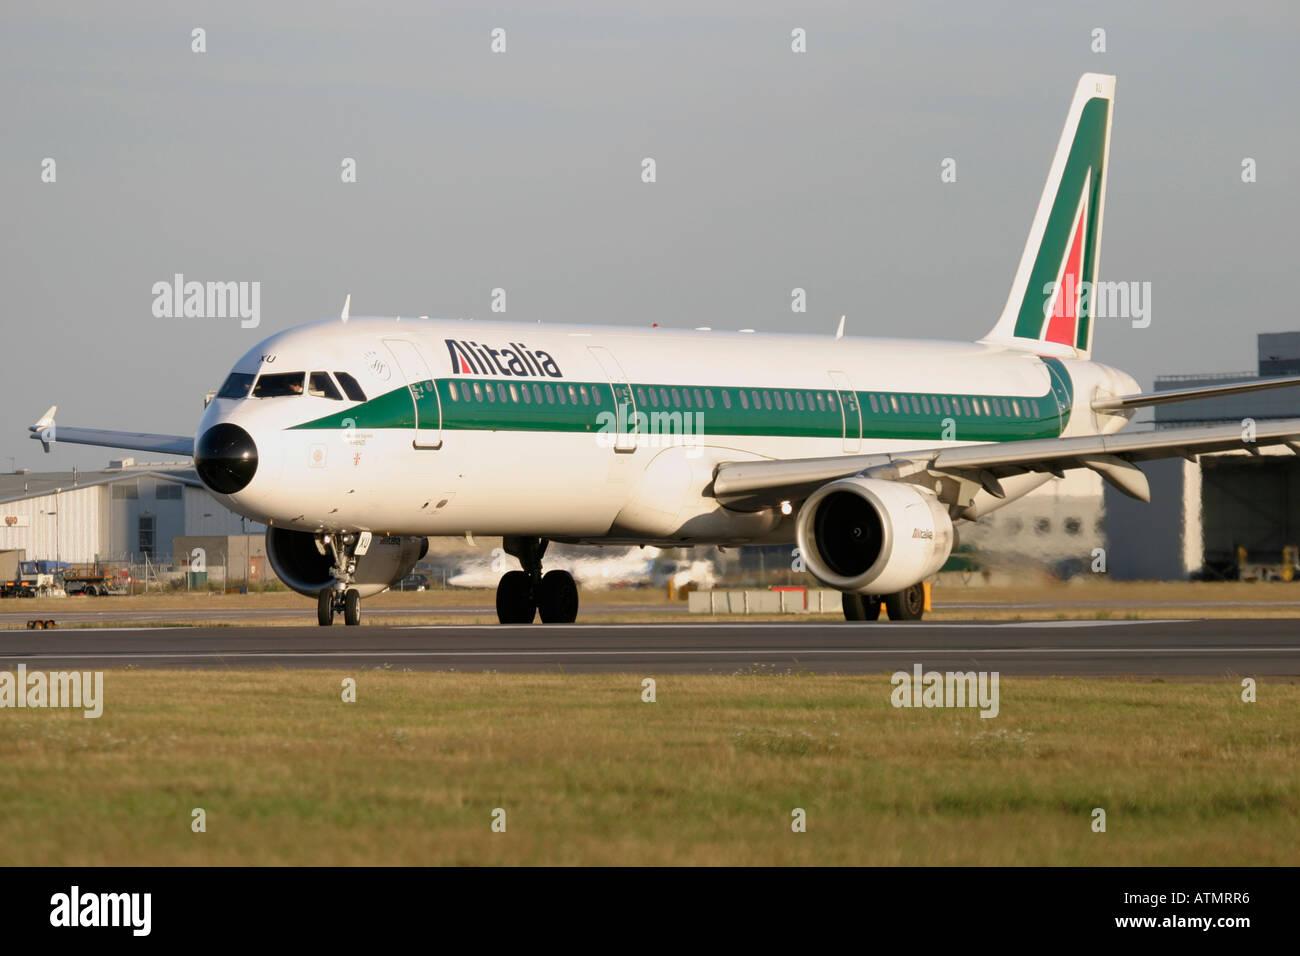 Alitalia Airbus A321-112 at London Heathrow Airport - Stock Image